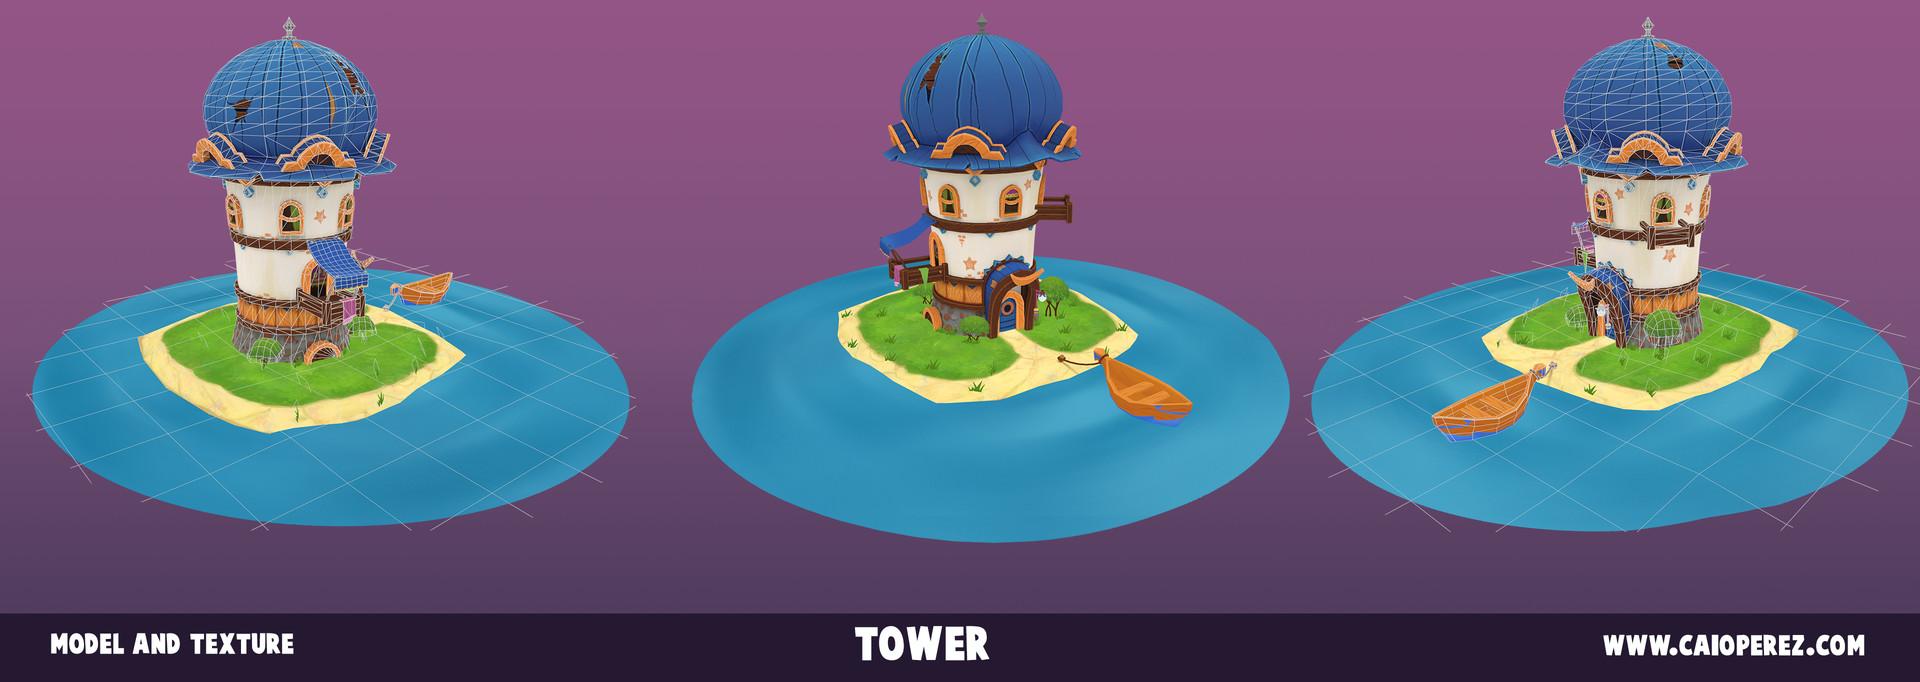 Caio perez torre render